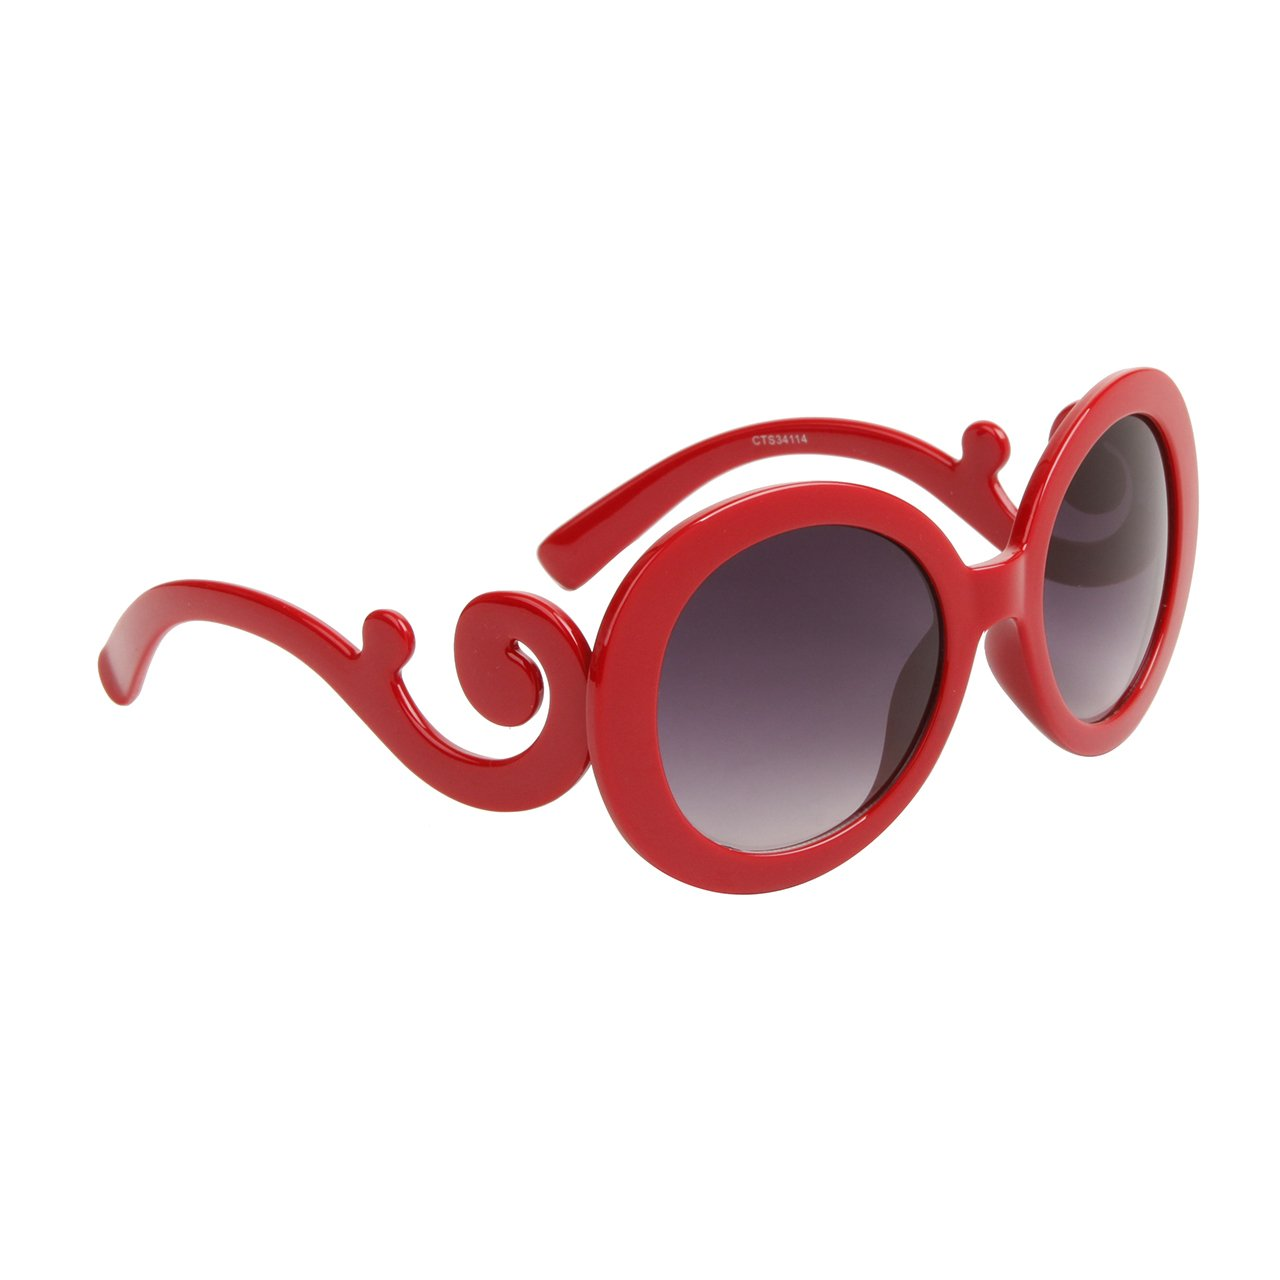 DESIGNER INSPIRED WOMEN'S SUNGLASSES RED FRAME TOP QUALITY UV PROTECTION